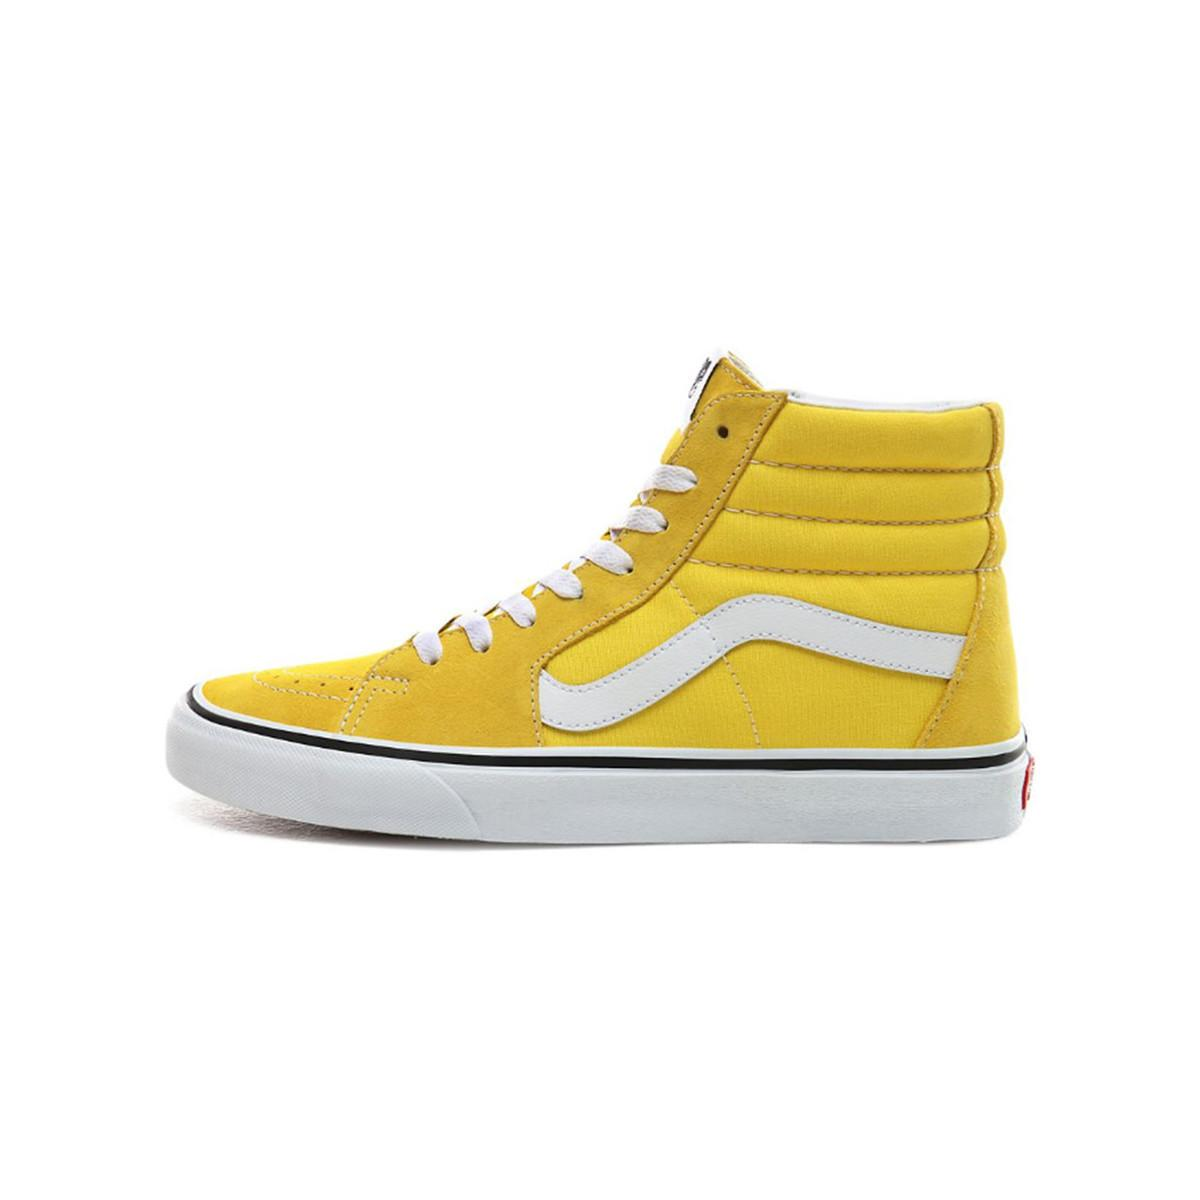 Basket SK8-HI femmes Chaussures en jaune Vans en coloris Jaune - Lyst